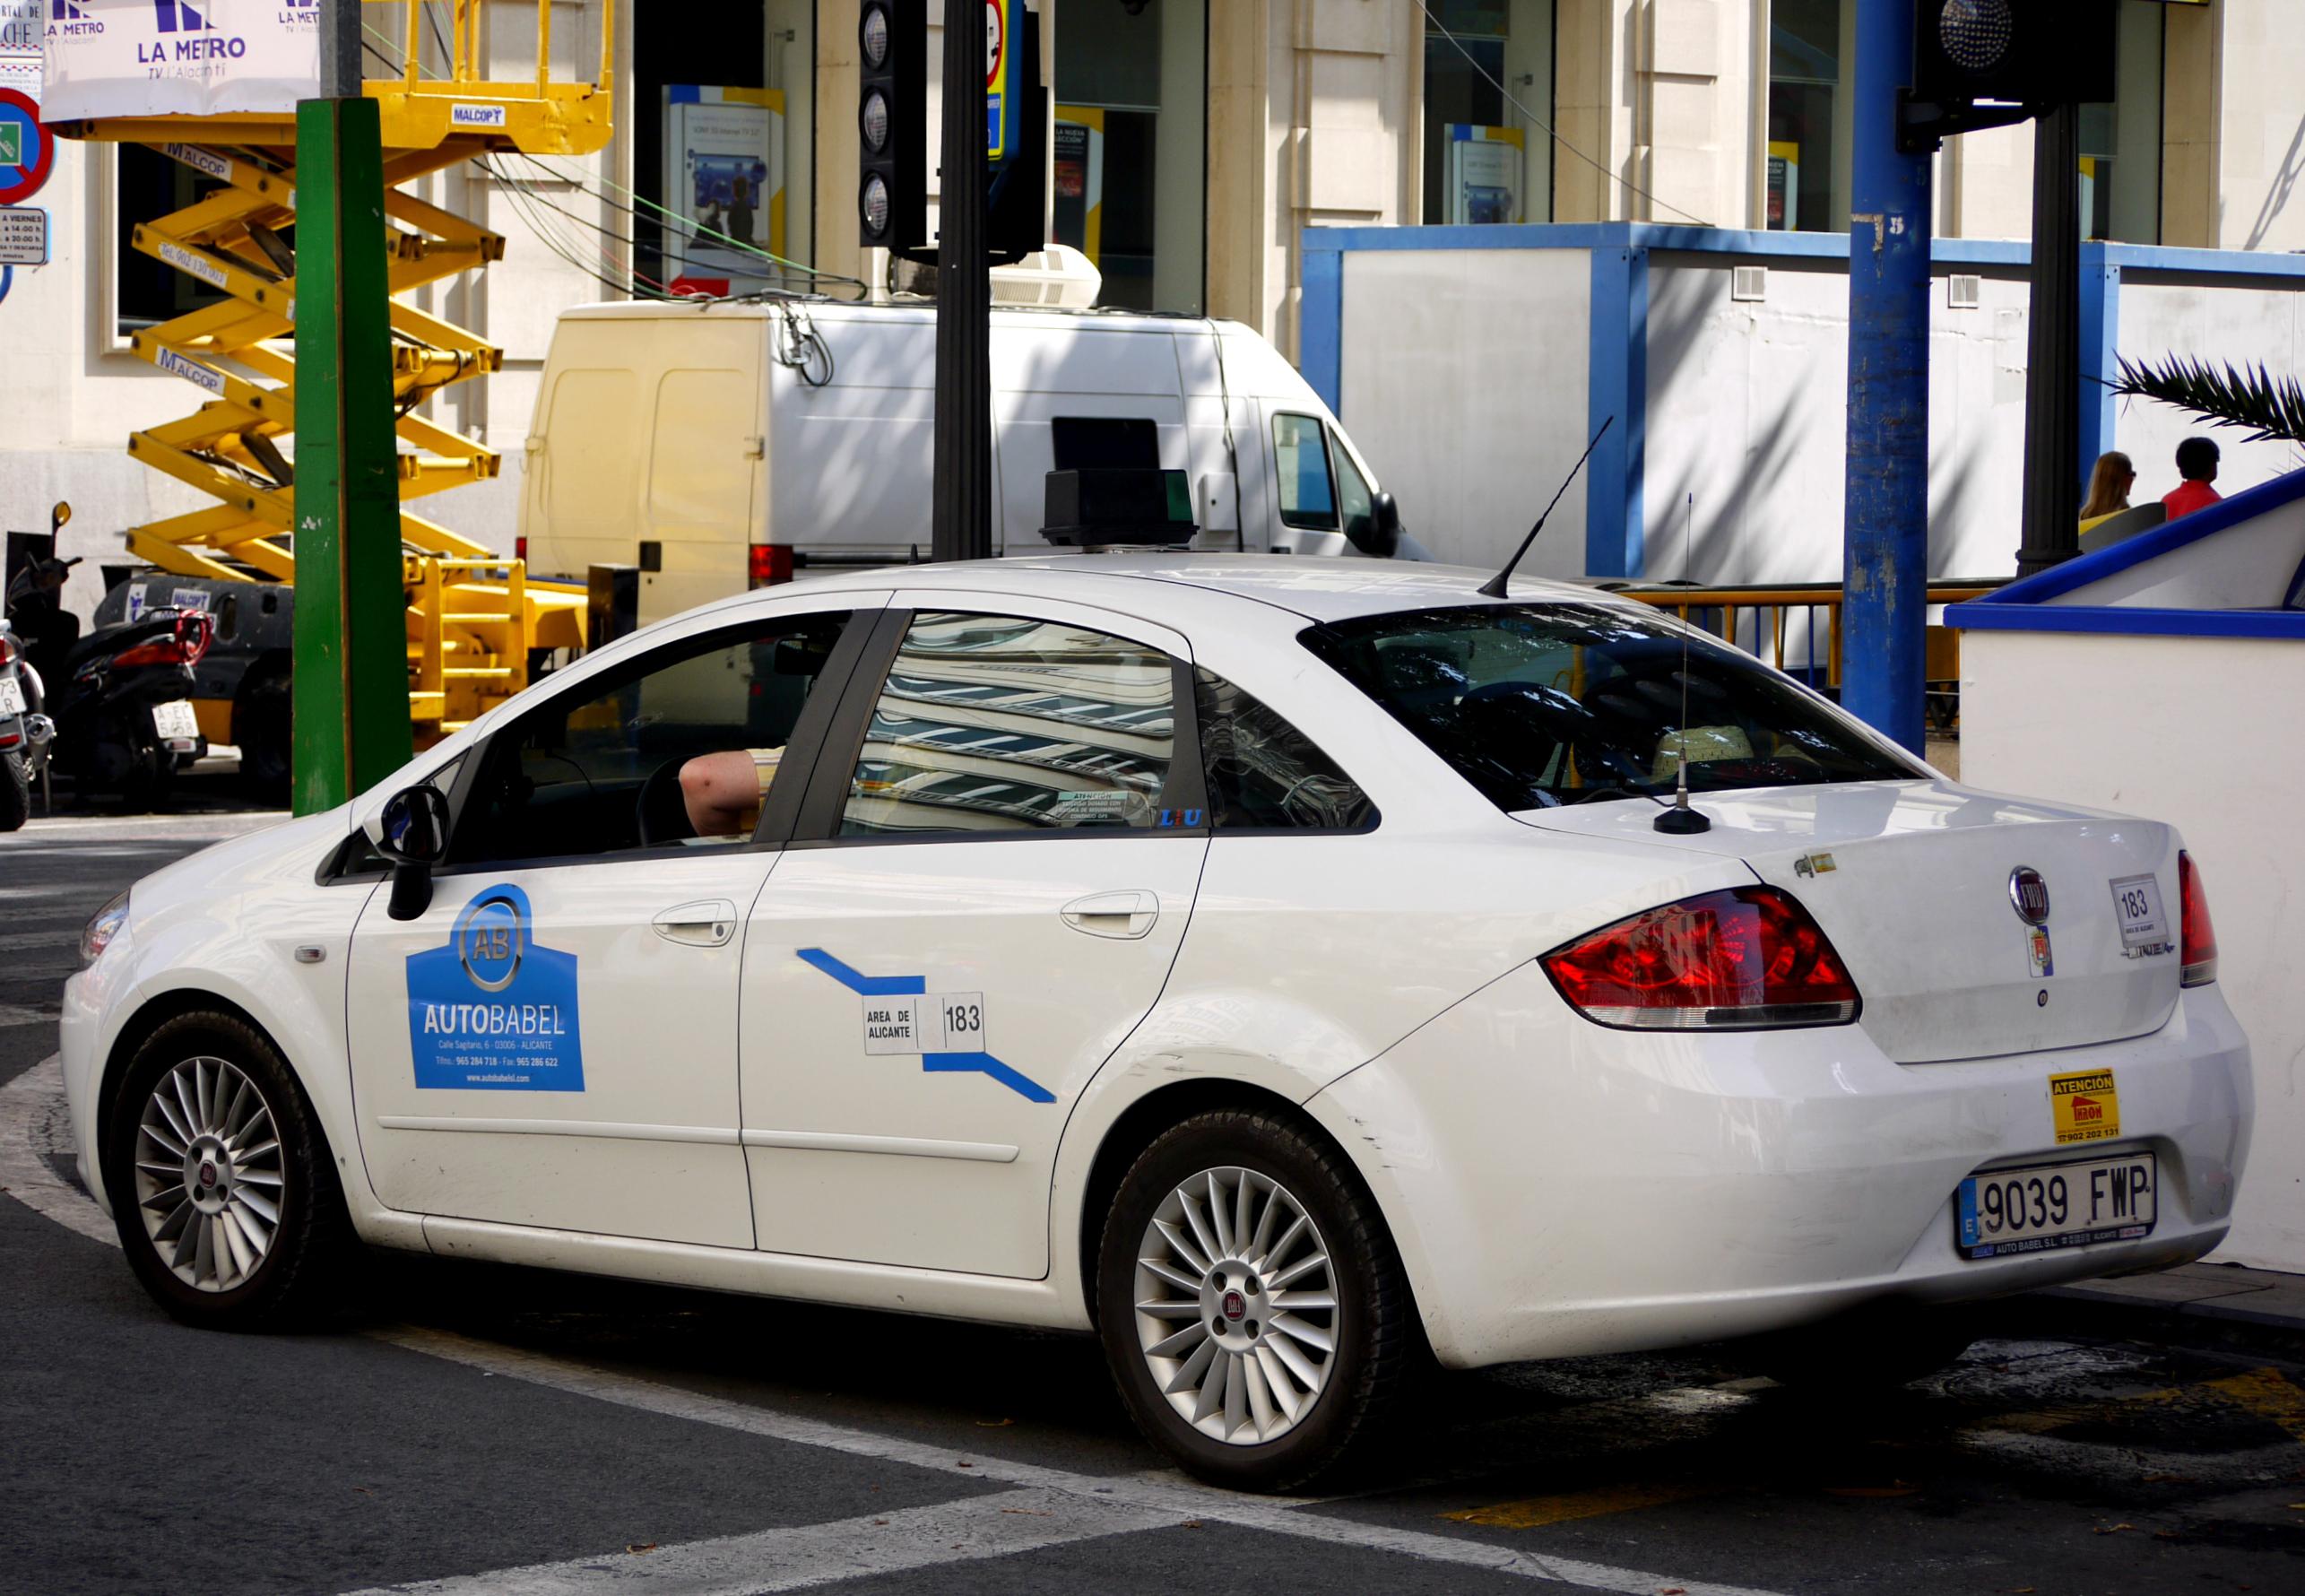 drive linea t abarth review revew cc jet punto test evo fiat com automobilians